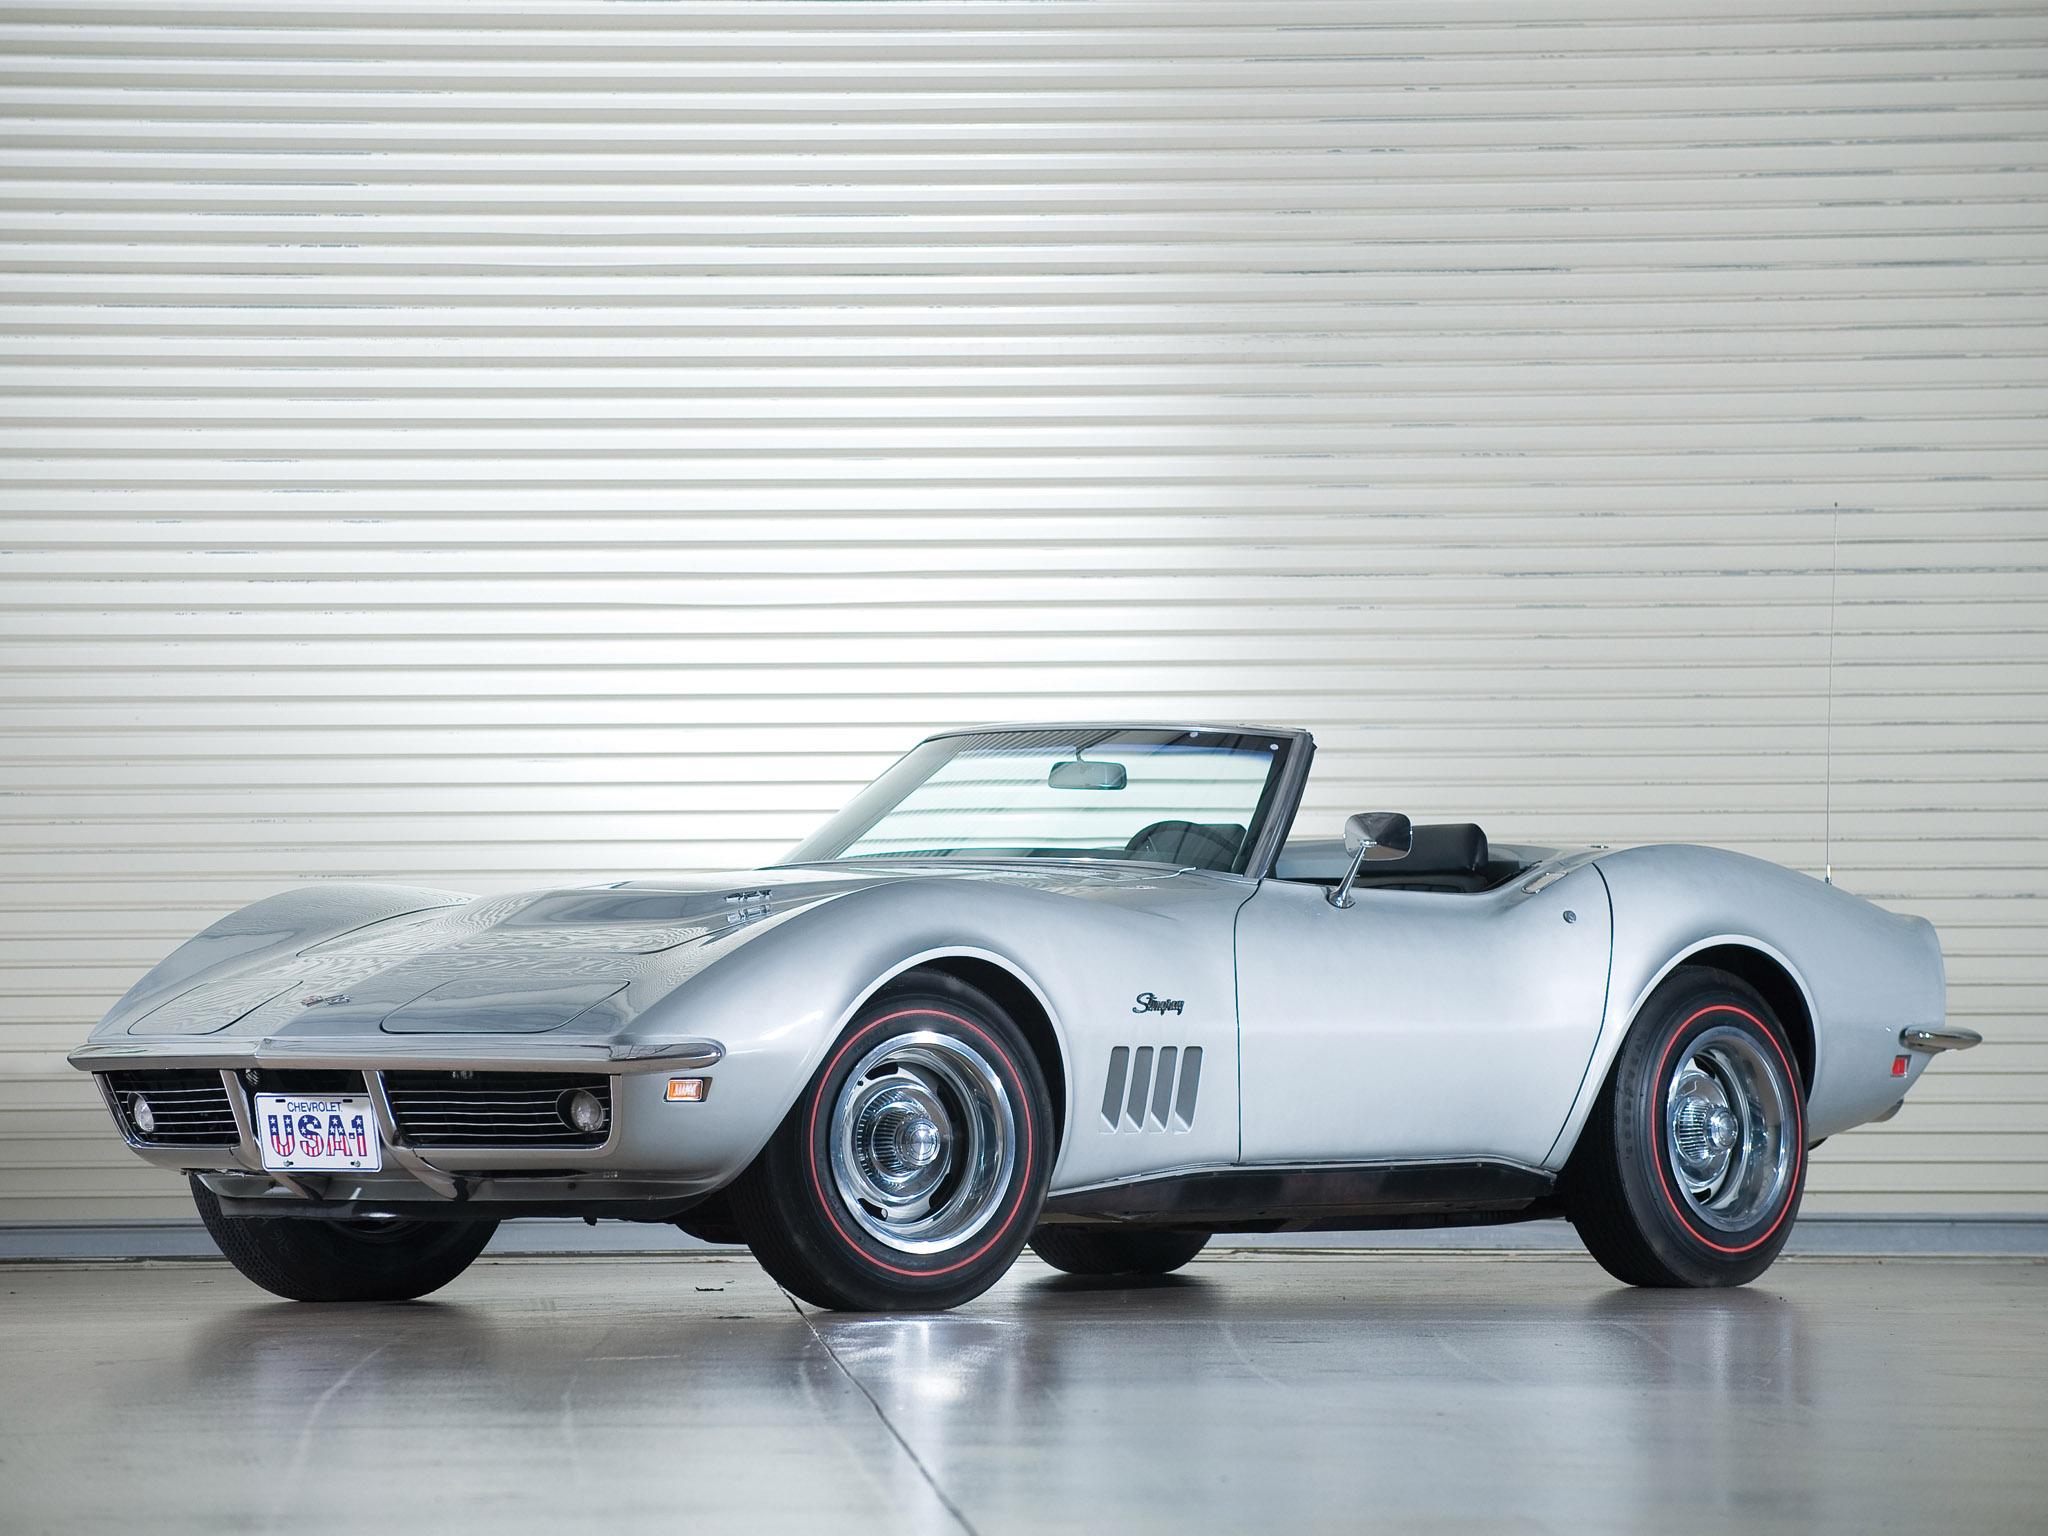 1969 chevrolet corvette c3 stingray l71 427 convertible classic muscle supercar supercars wallpaper 2048x1536 108712 wallpaperup - Corvette Stingray 1969 Wallpaper